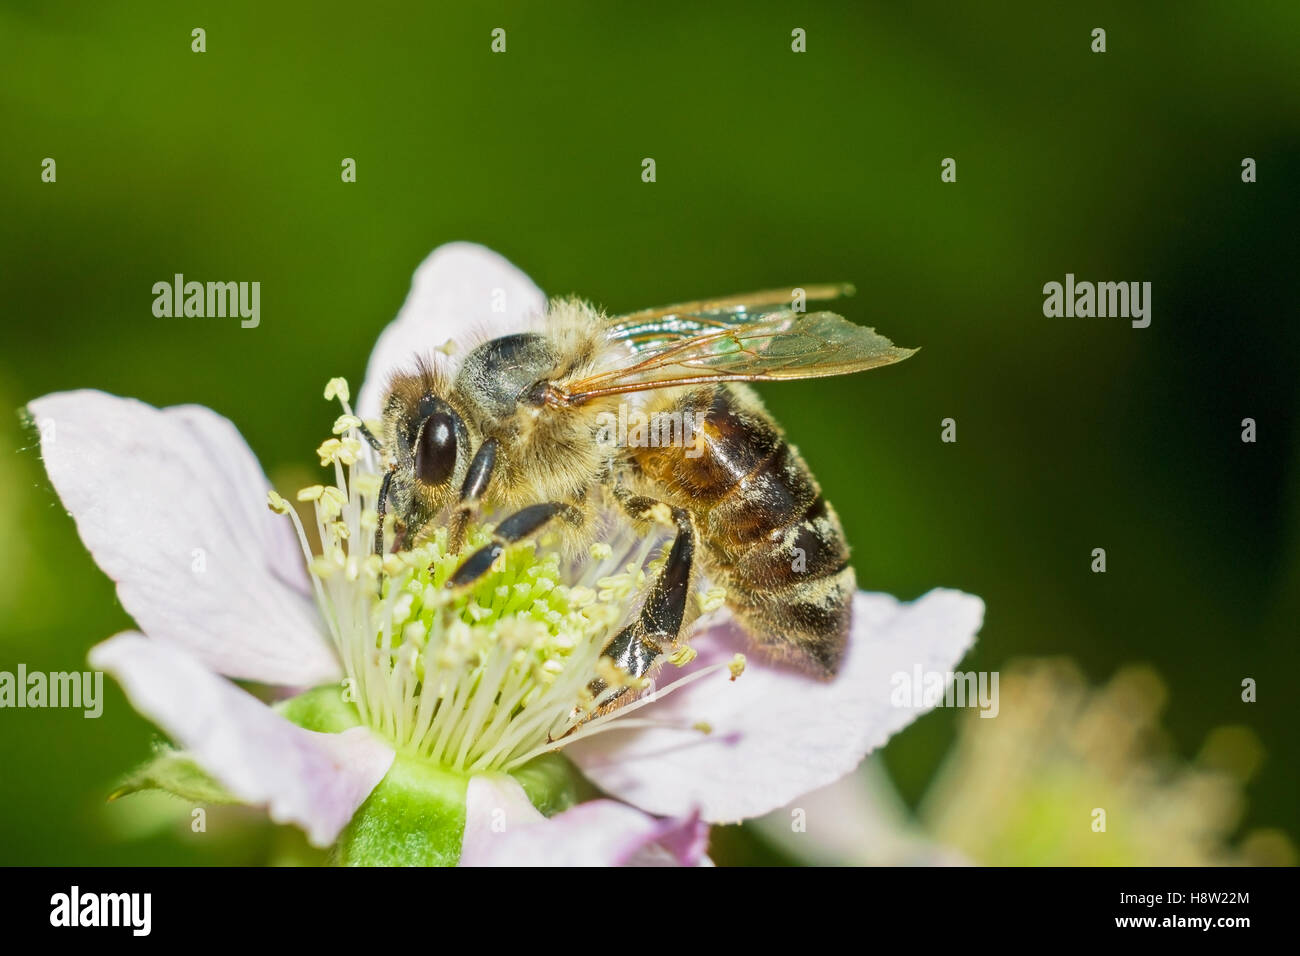 Honigbiene auf Blackberry Blume Stockbild